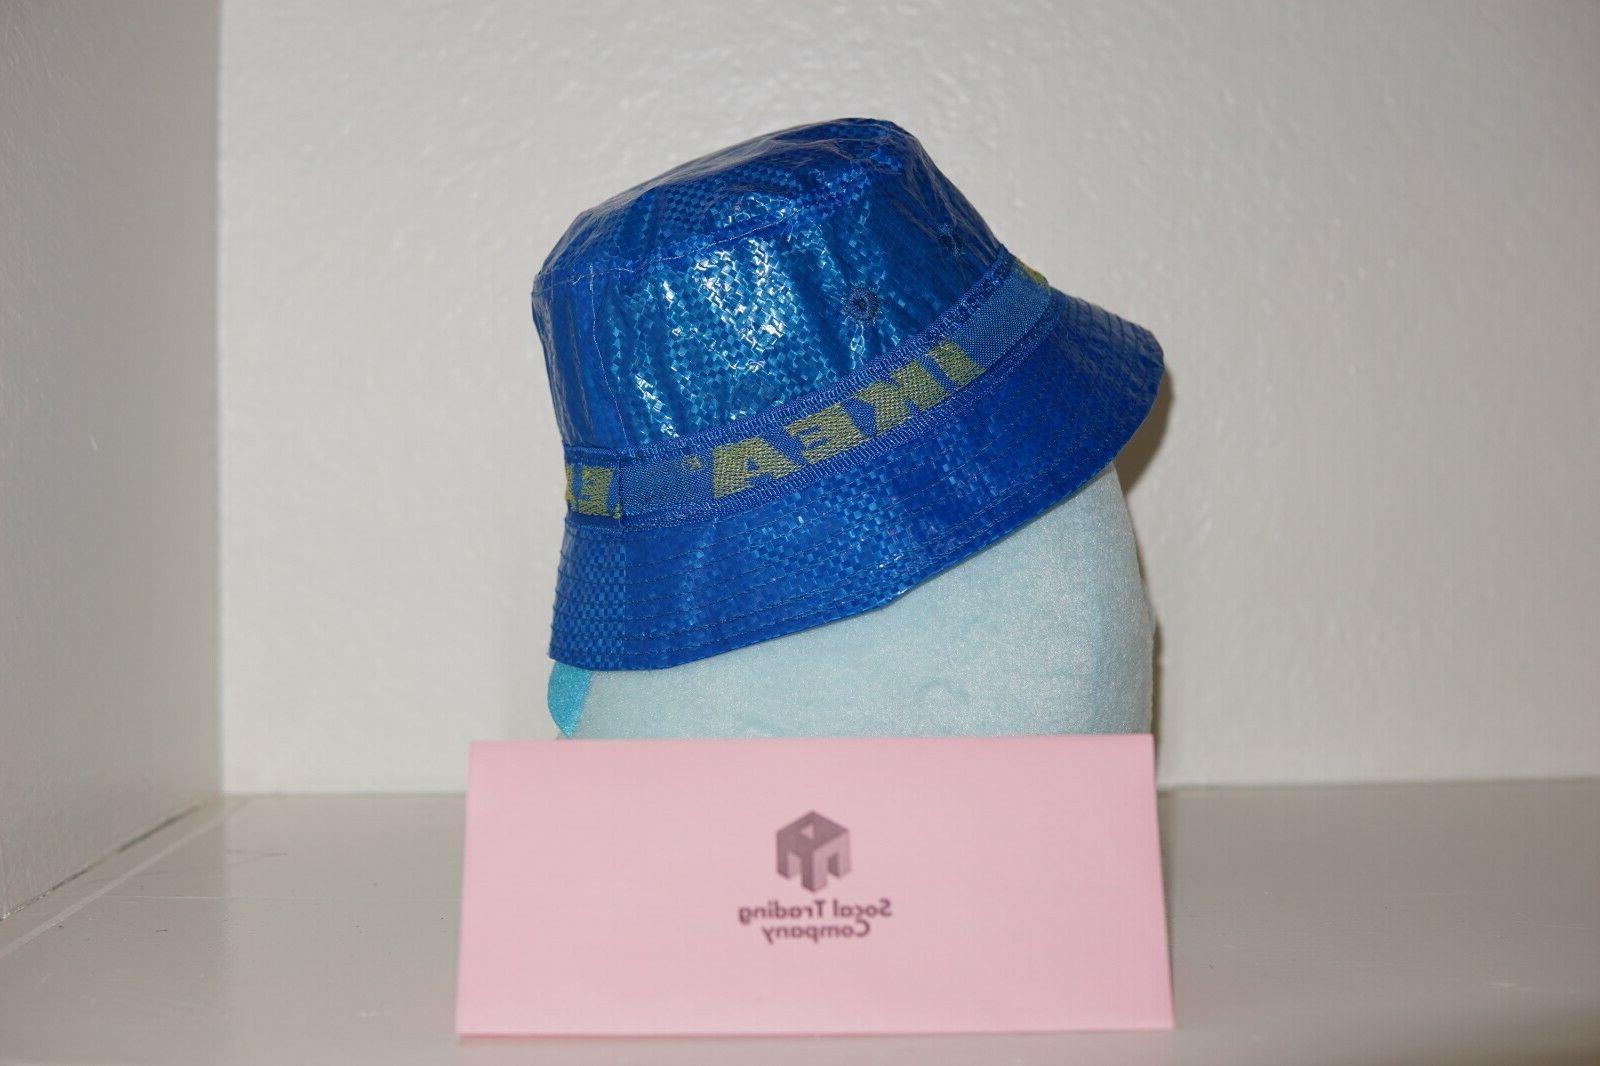 IKEA Bucket KNORVA Frakta Blue Kangol Rain Fisherman Hat Limited